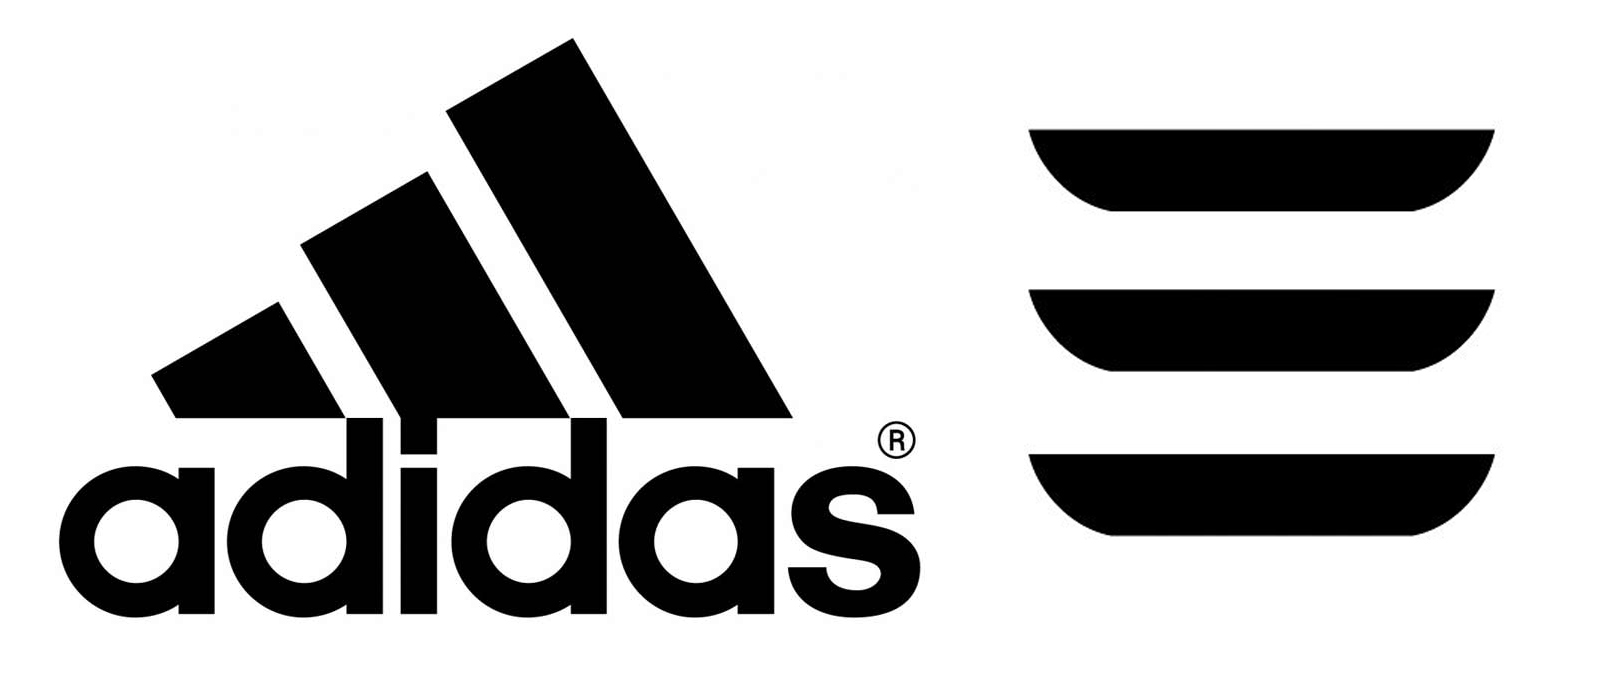 Adidas and Tesla Model 3 logos